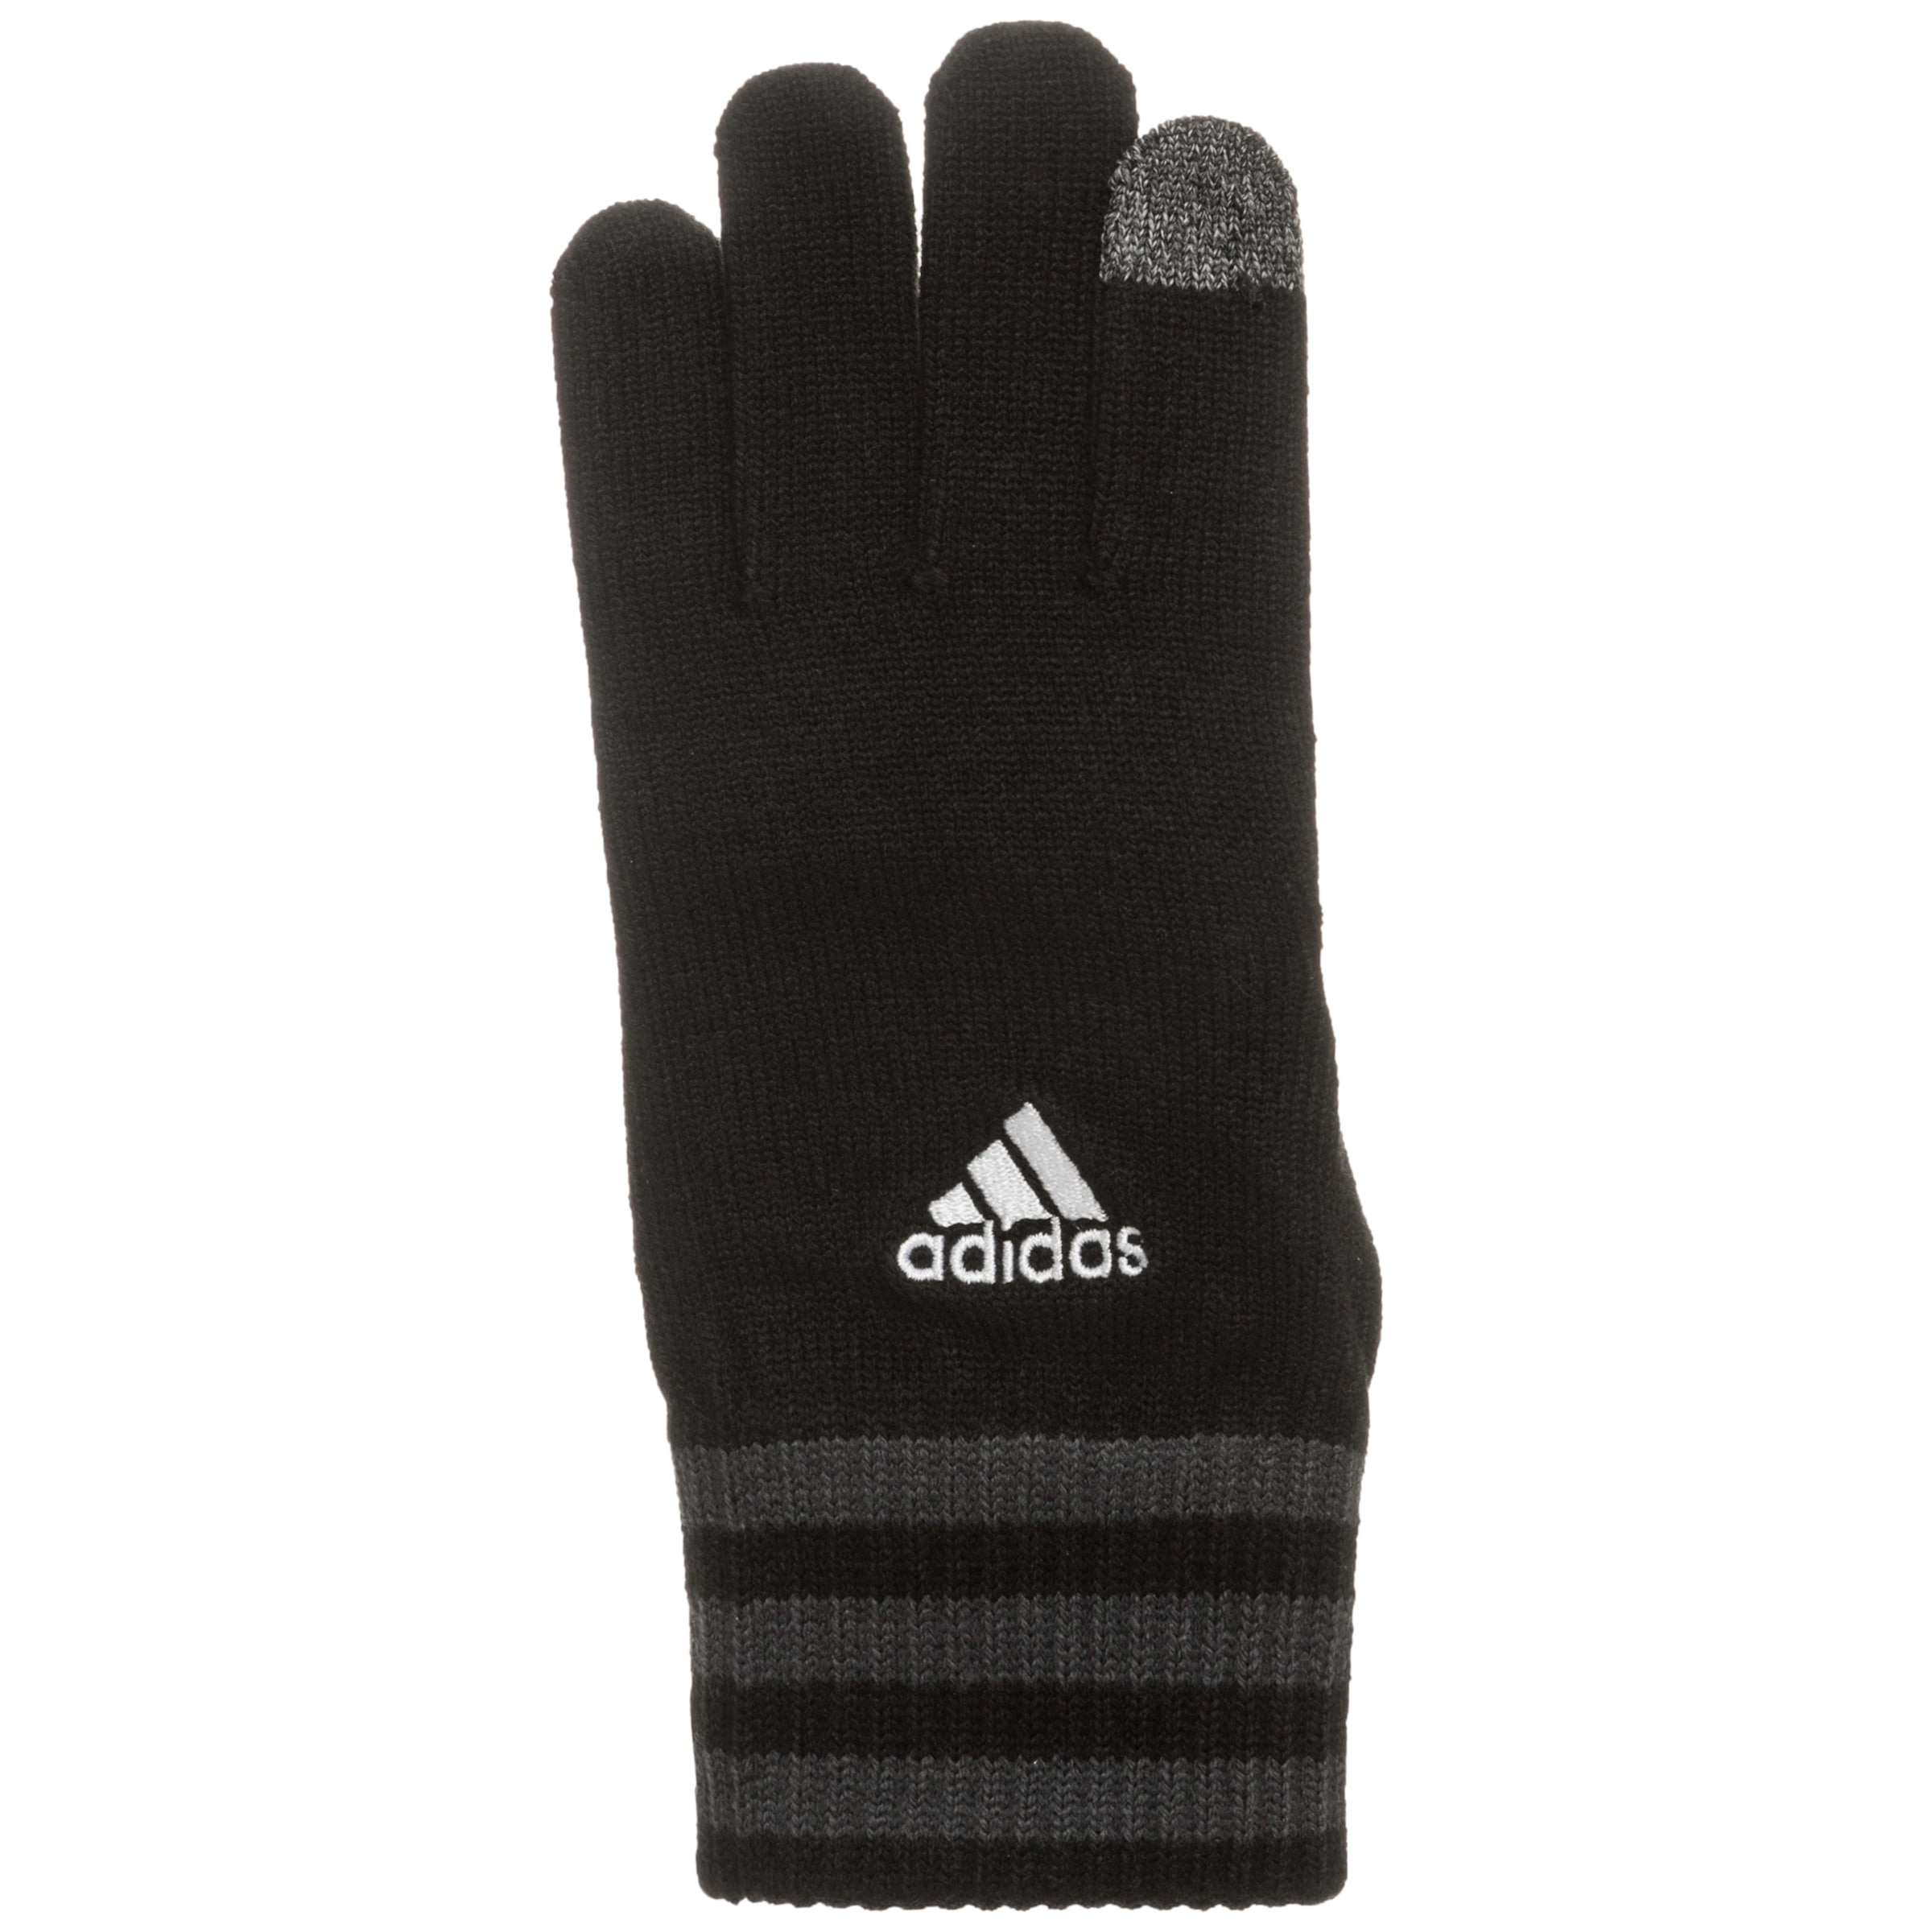 Adidas Schwarz Performance 'tiro' In Feldspielerhandschuhe xeodCBrW